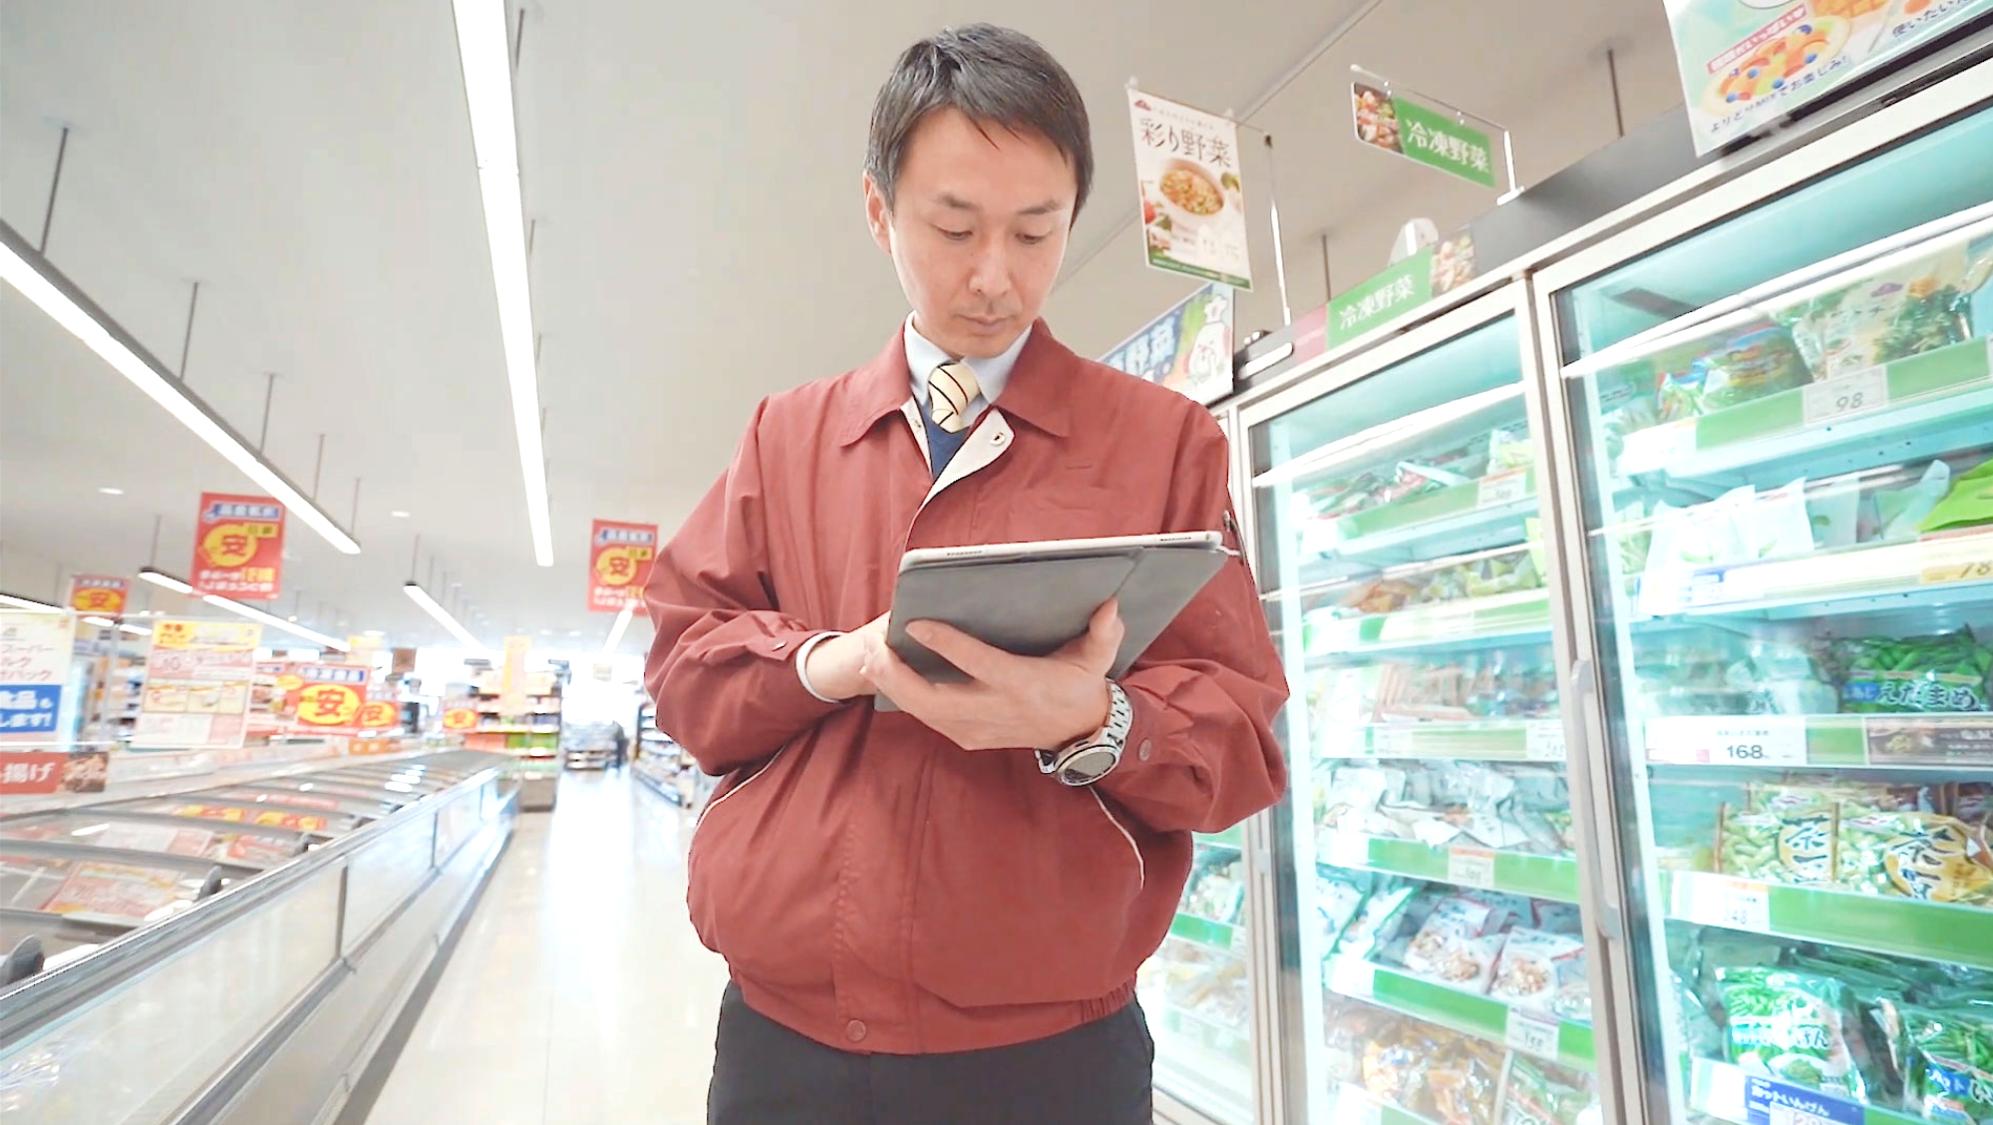 iPadを使って店舗からチャットボットを利用する荒井氏